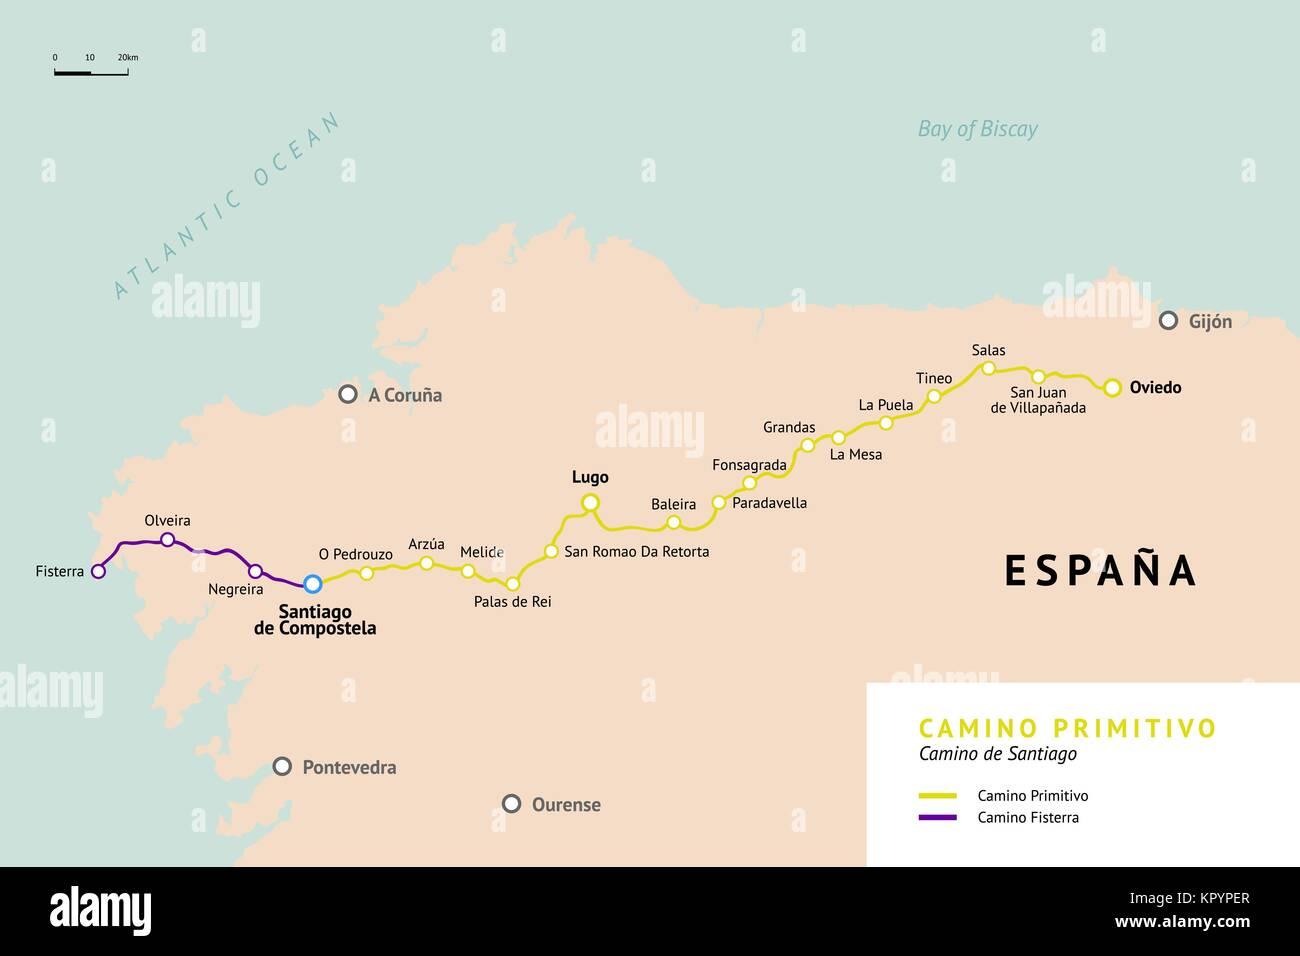 Camino Primitivo map. Original route from Oviedo. Camino De Santiago or The Way of St.James. Ancient pilgrimage - Stock Image